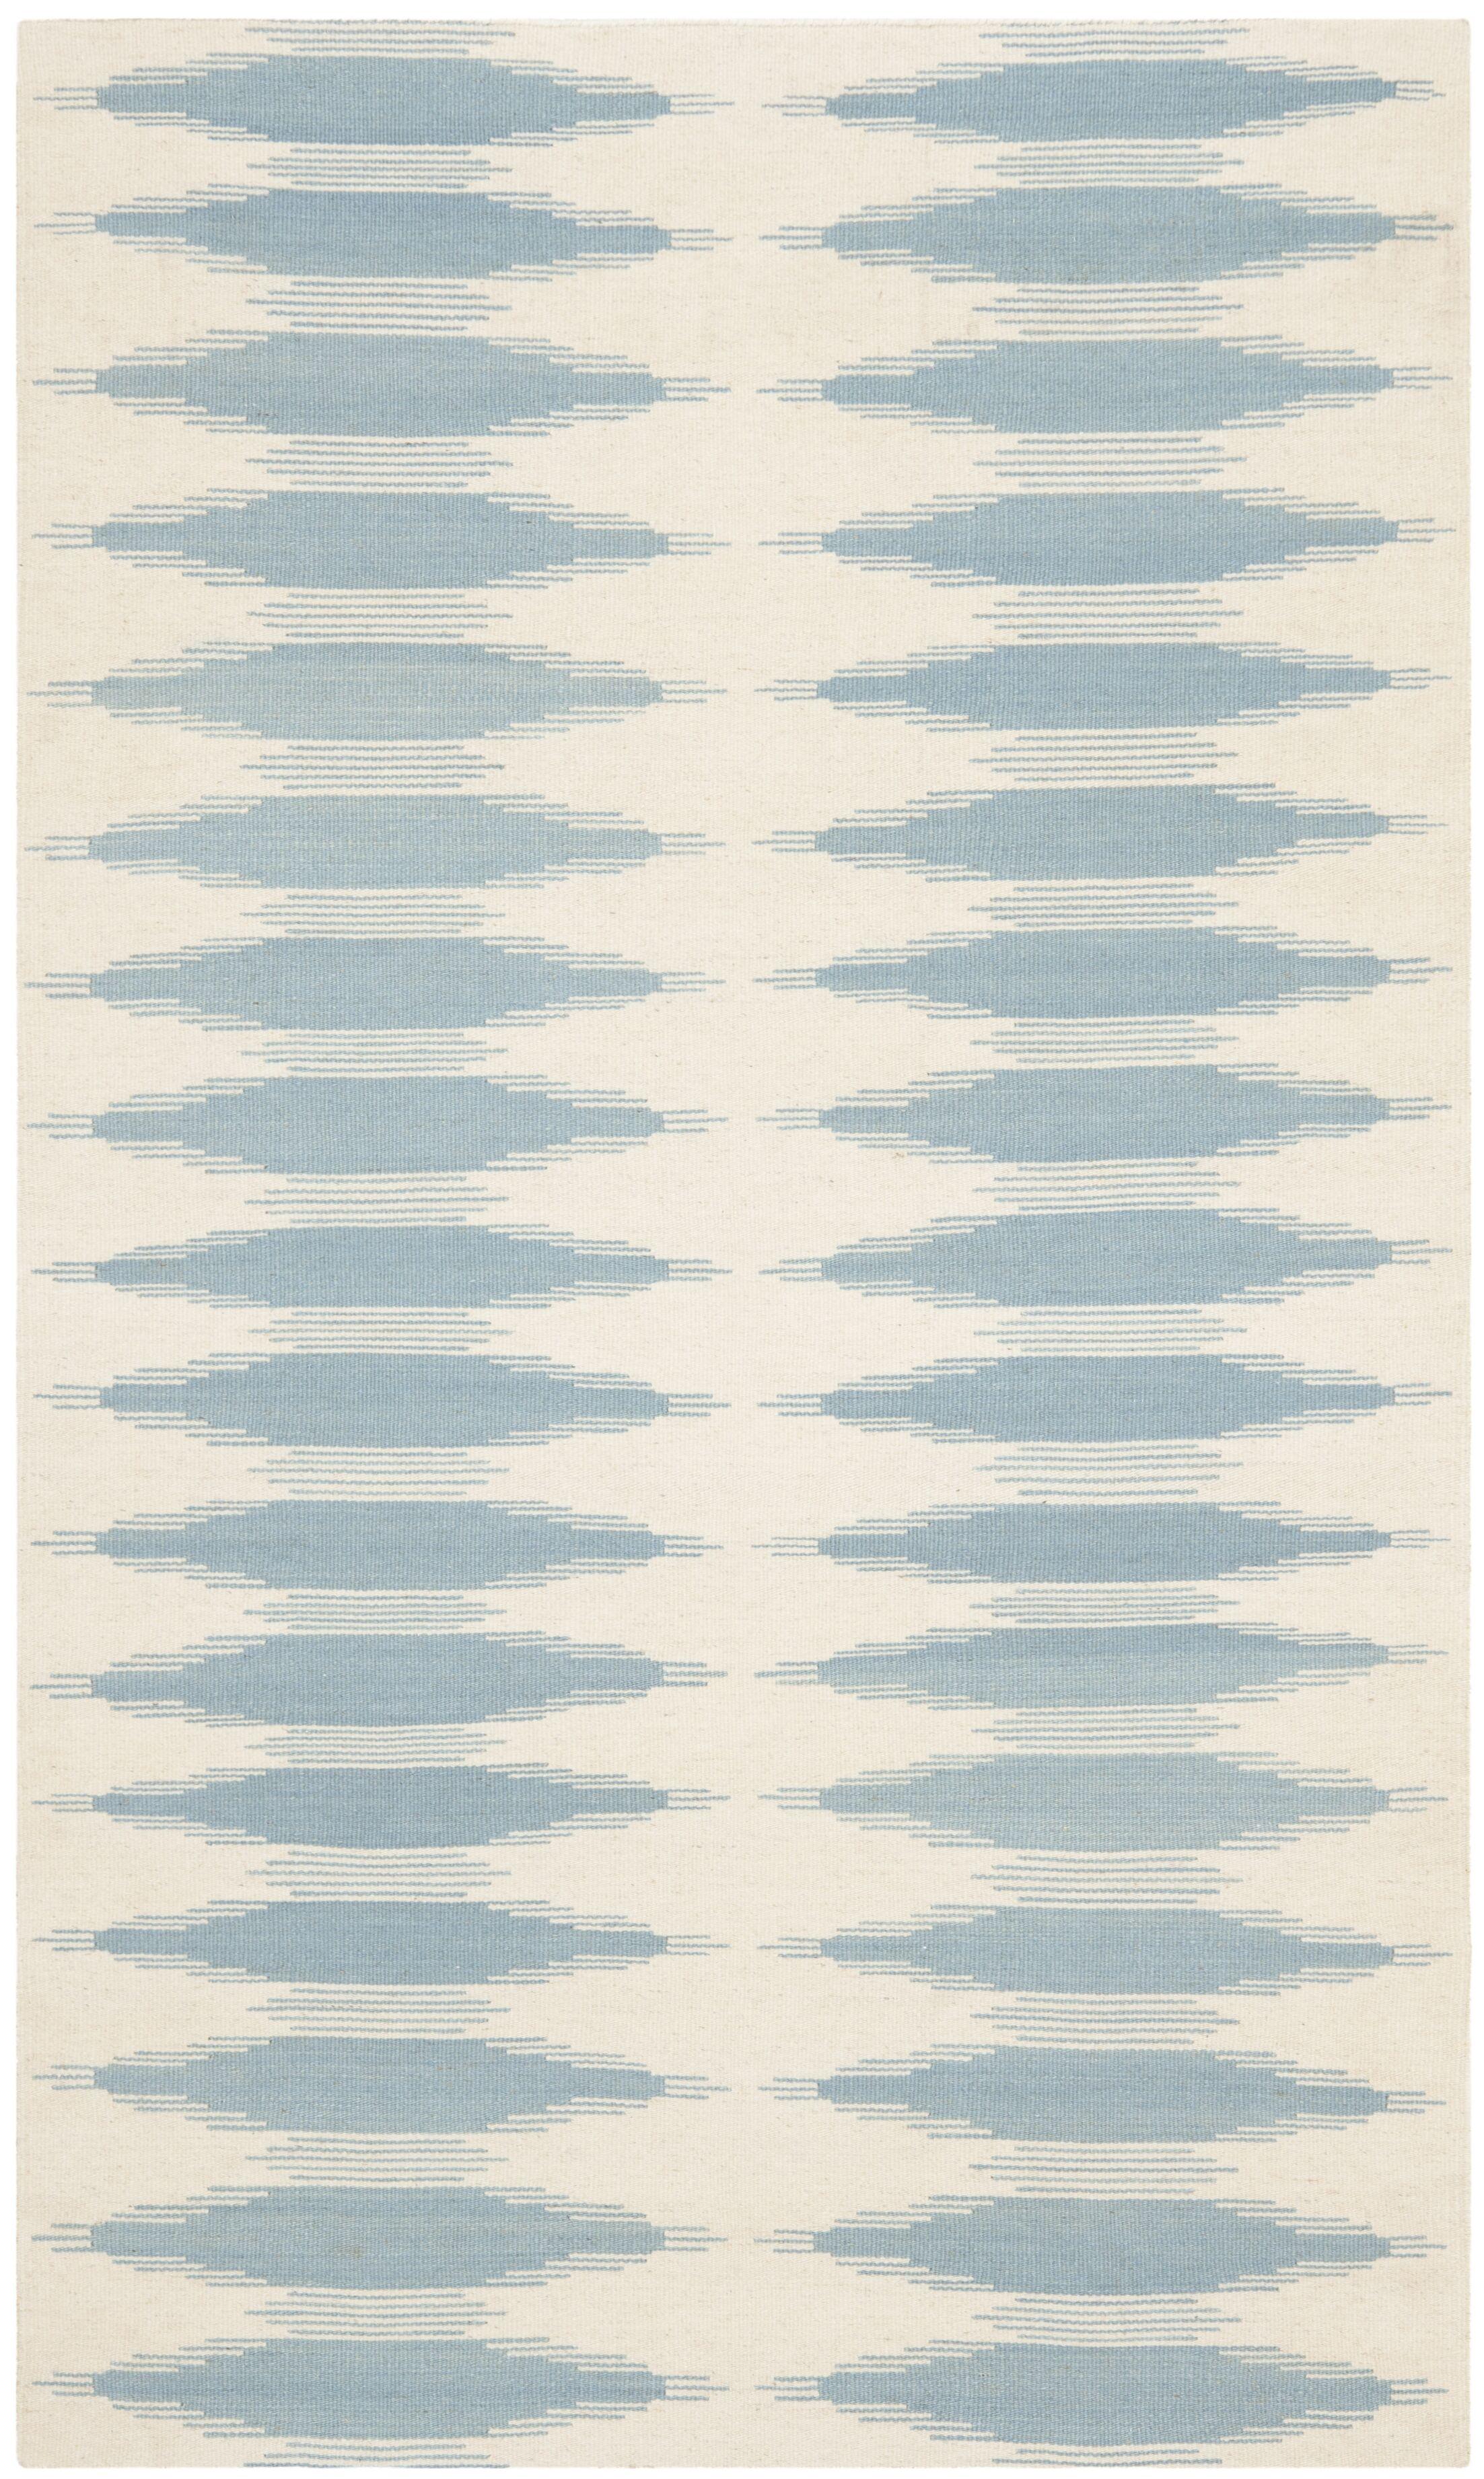 Brook Lane Ivory & Blue Area Rug Rug Size: Rectangle 4' x 6'